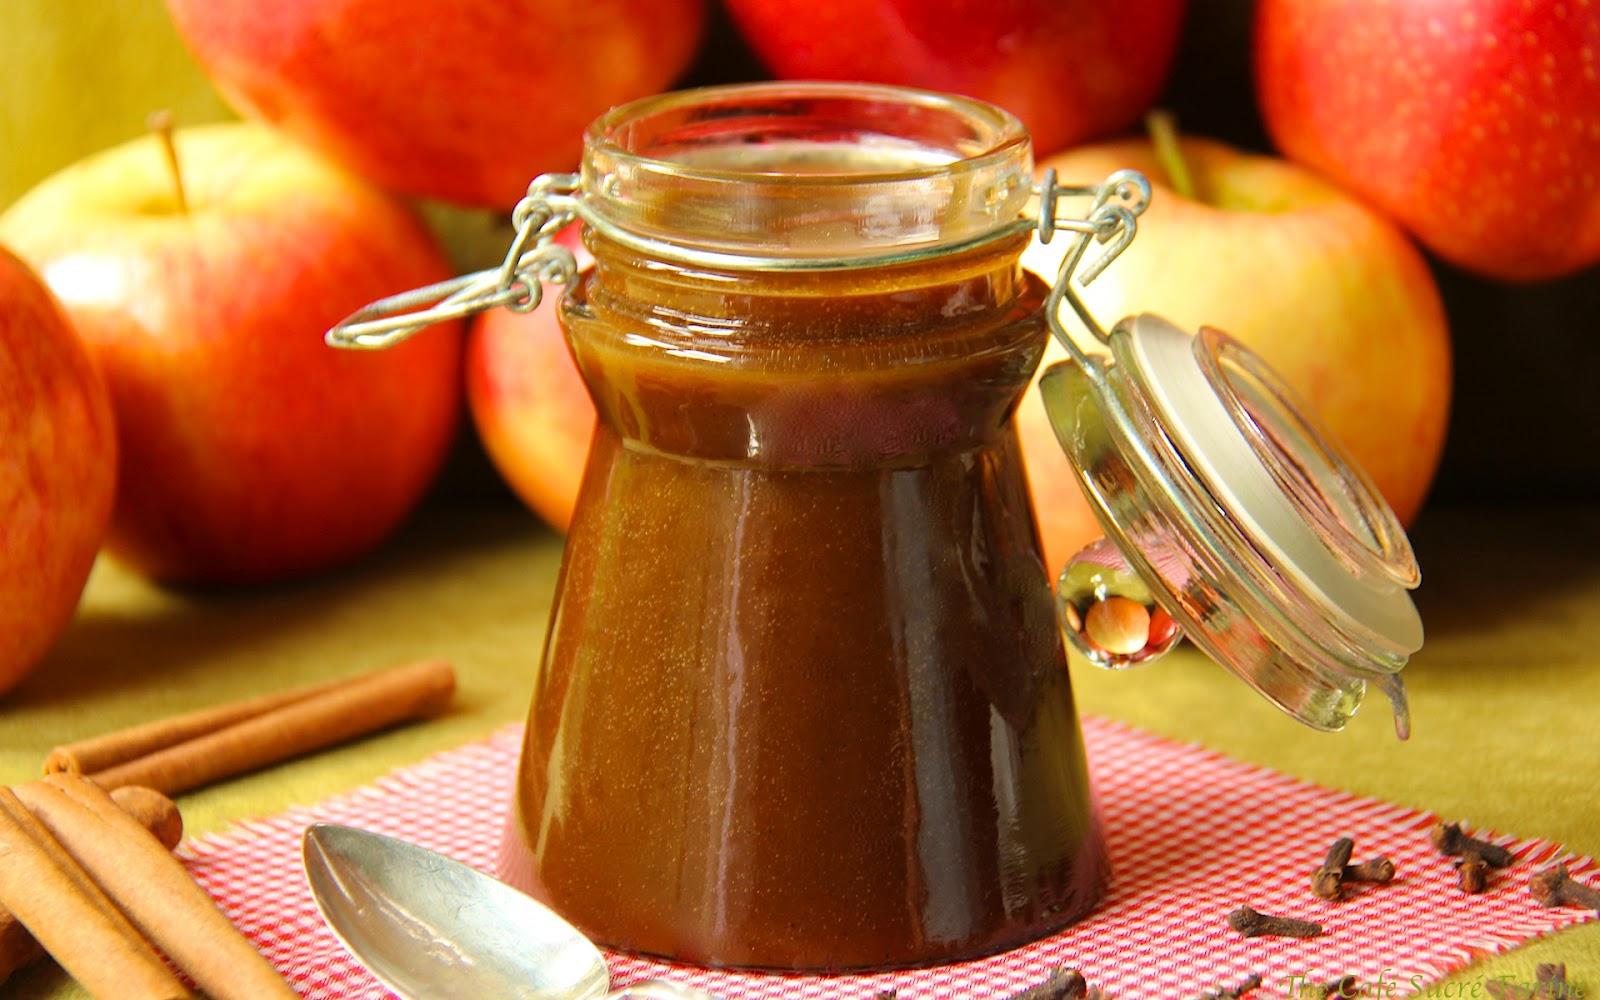 Autumn-Spiced Apple Cider Caramel Sauce - The Ridiculously Easy Way ...